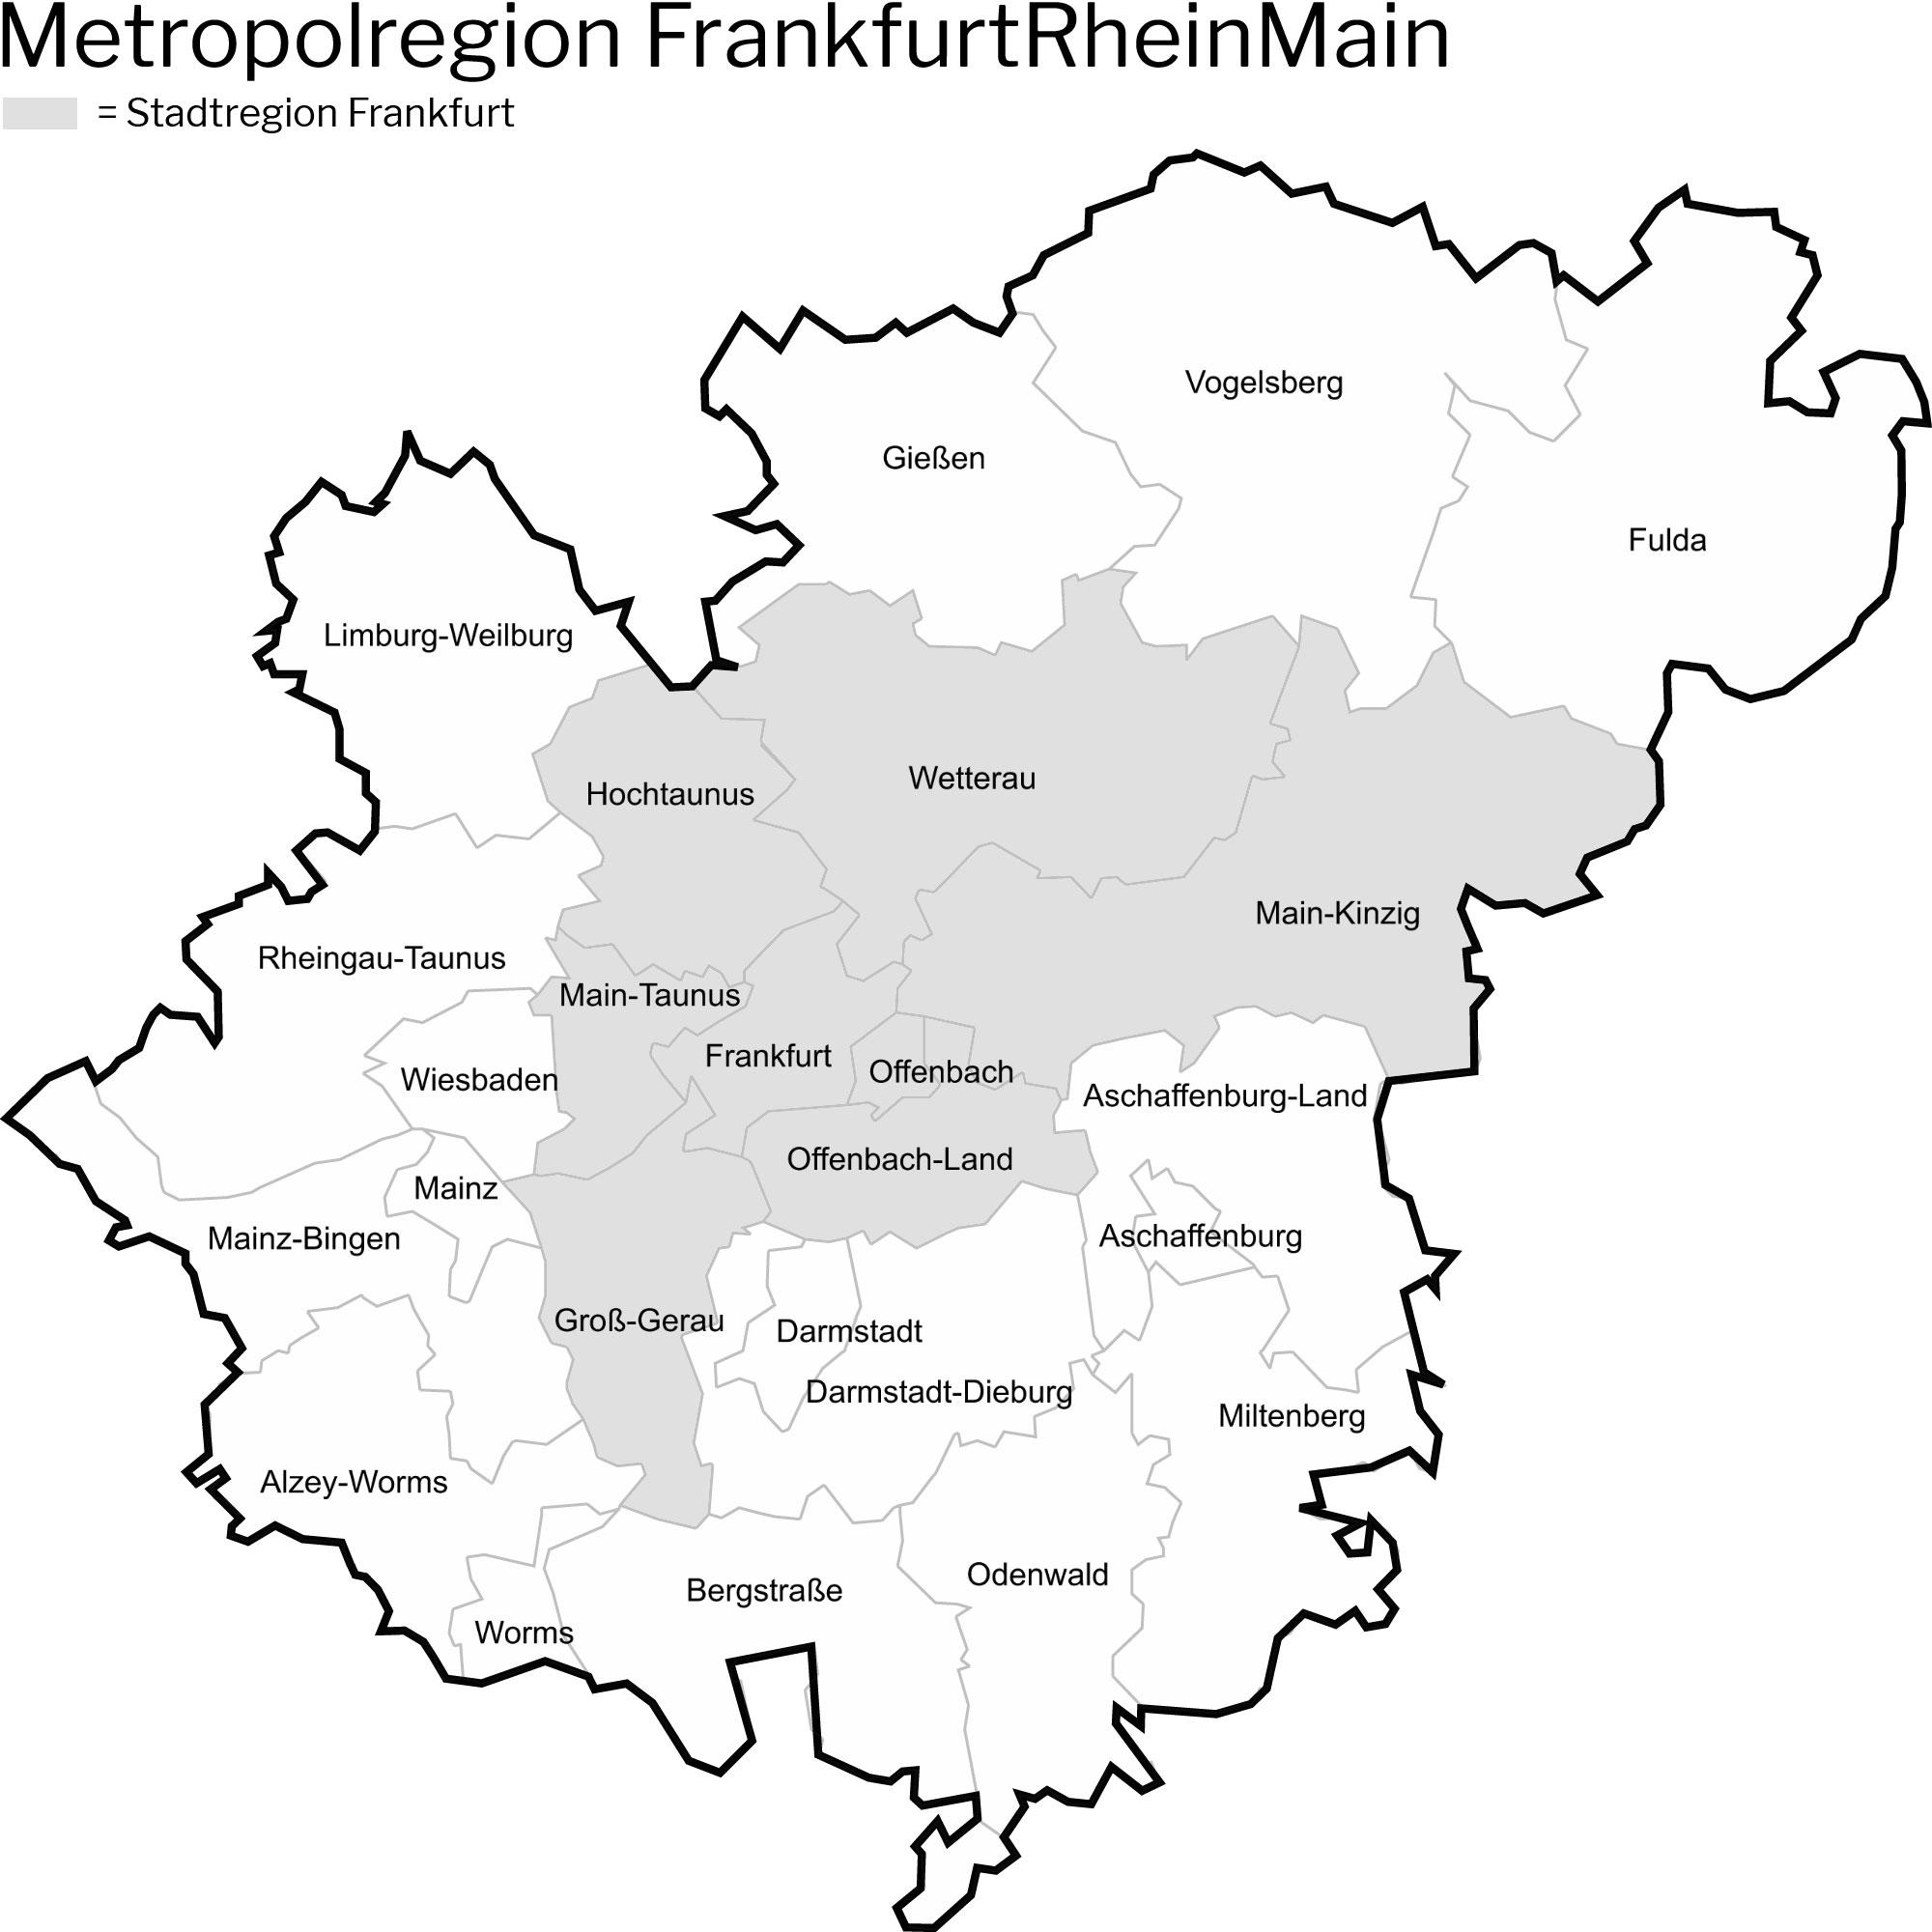 Rhein-Main-Gebiet Karte - Definition - Metropolregion FrankfurtRheinMain - Definition